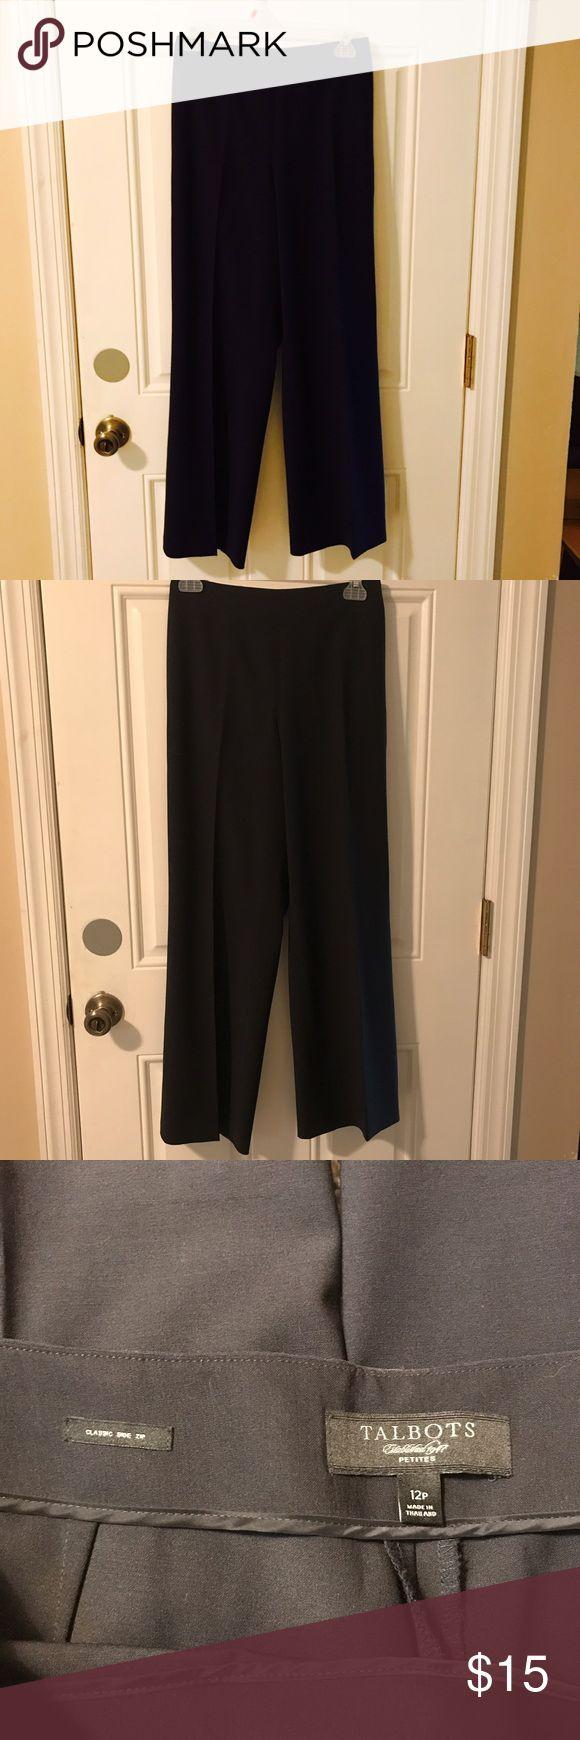 "Talbots navy blue dress pants Talbots navy blue dress pants.  Classic side zip. Inseam 28"", waist 17"".   Size 12P Talbots Pants Trousers"